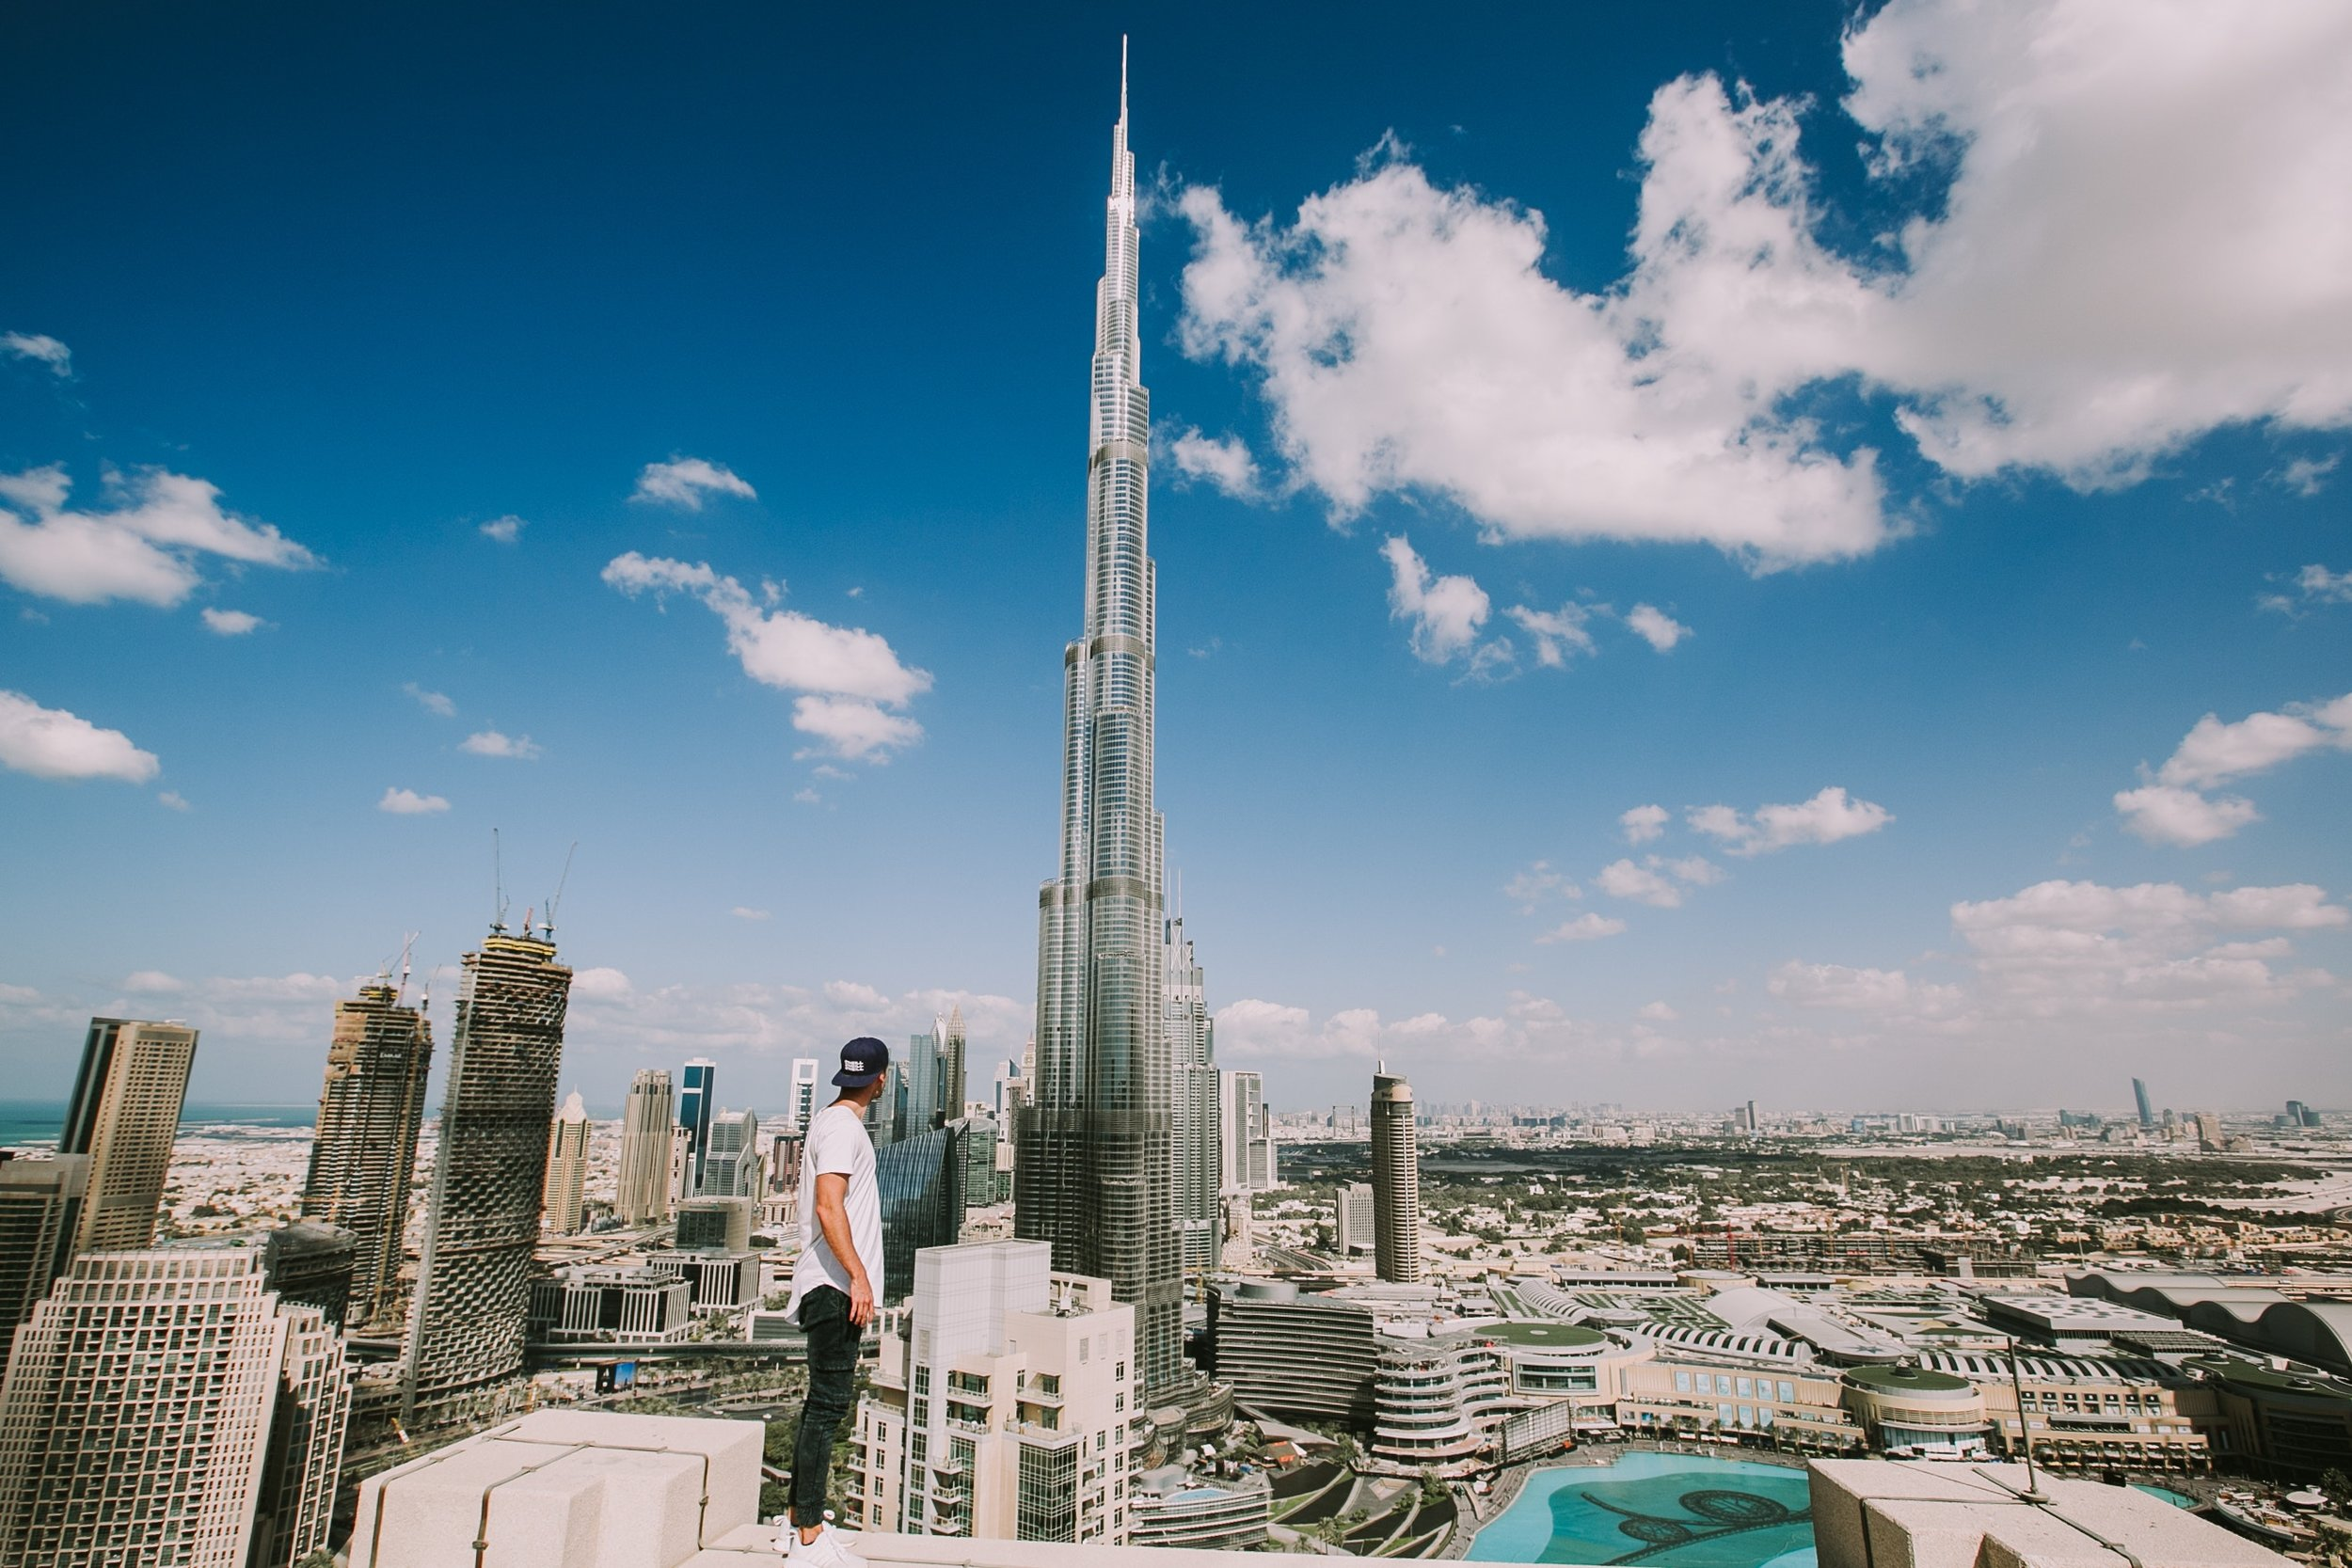 I hear Ideasicle is big in Dubai. (Photo by  denis harsch on  Unsplash )